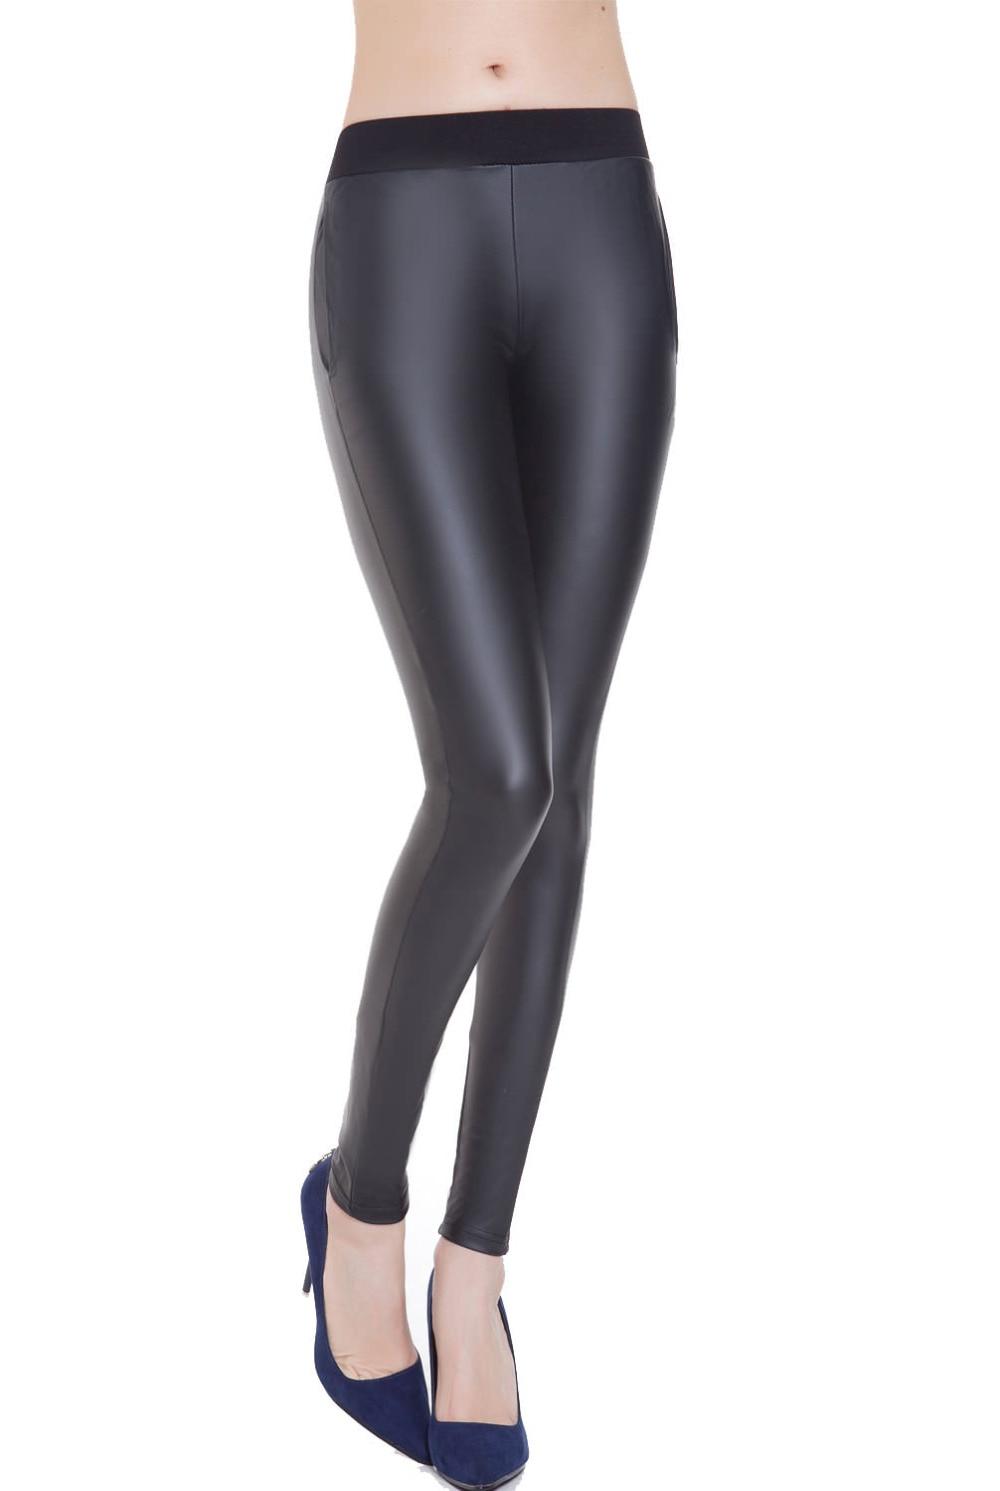 Everbellus Push Up Leather Leggings Fitness Femme Bright Leather Leggins Sexy Women Stretchy Black Casual Medium Waist Pants